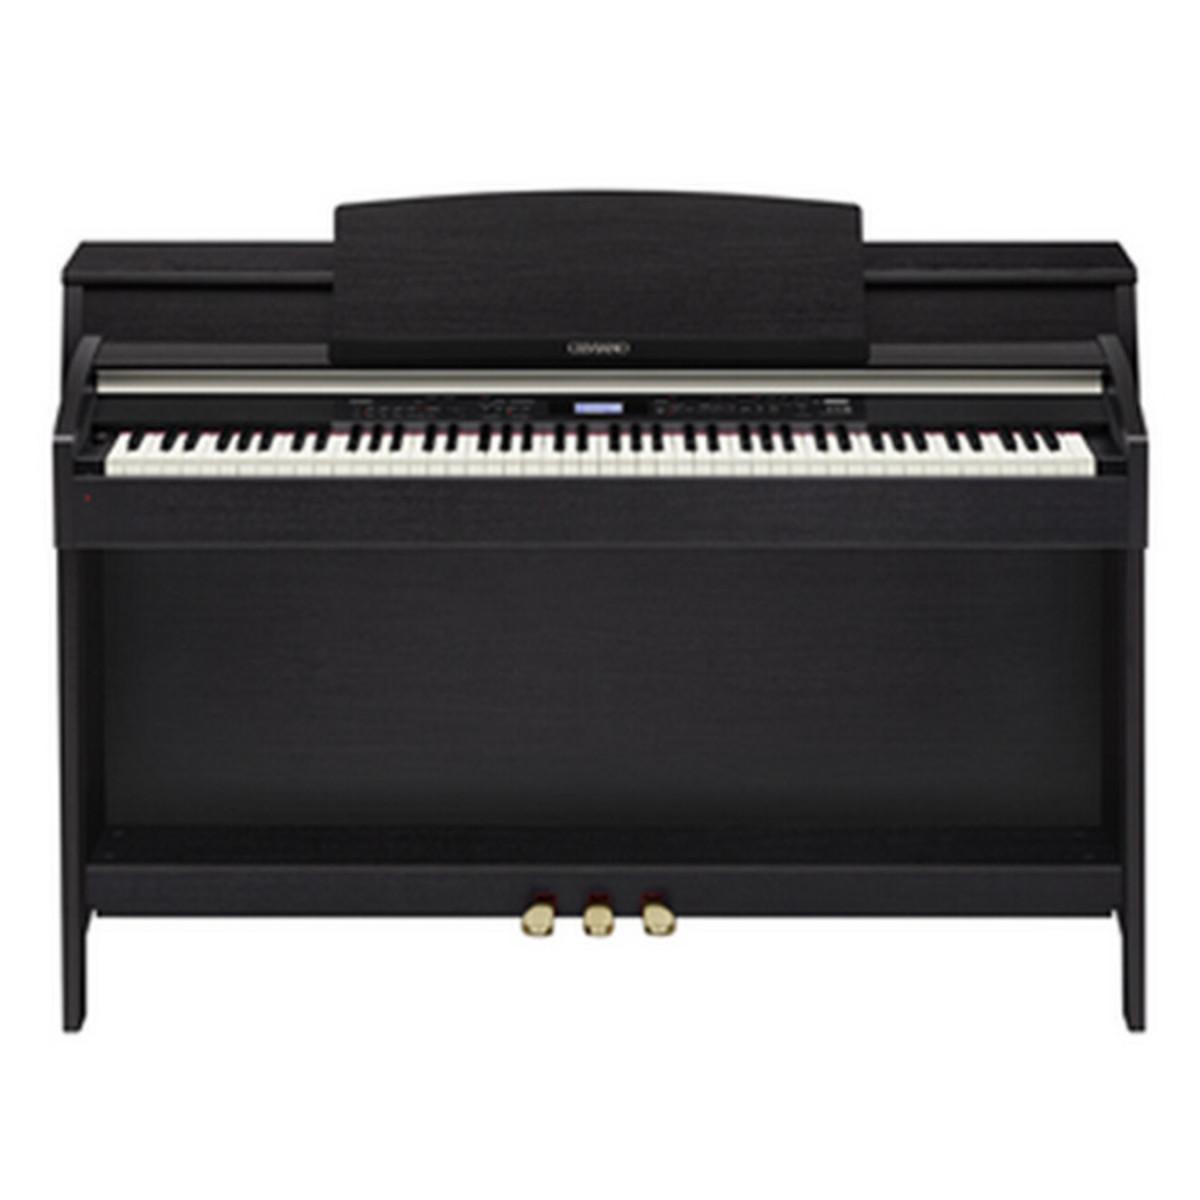 disc casio celviano ap 620 digital piano black at. Black Bedroom Furniture Sets. Home Design Ideas